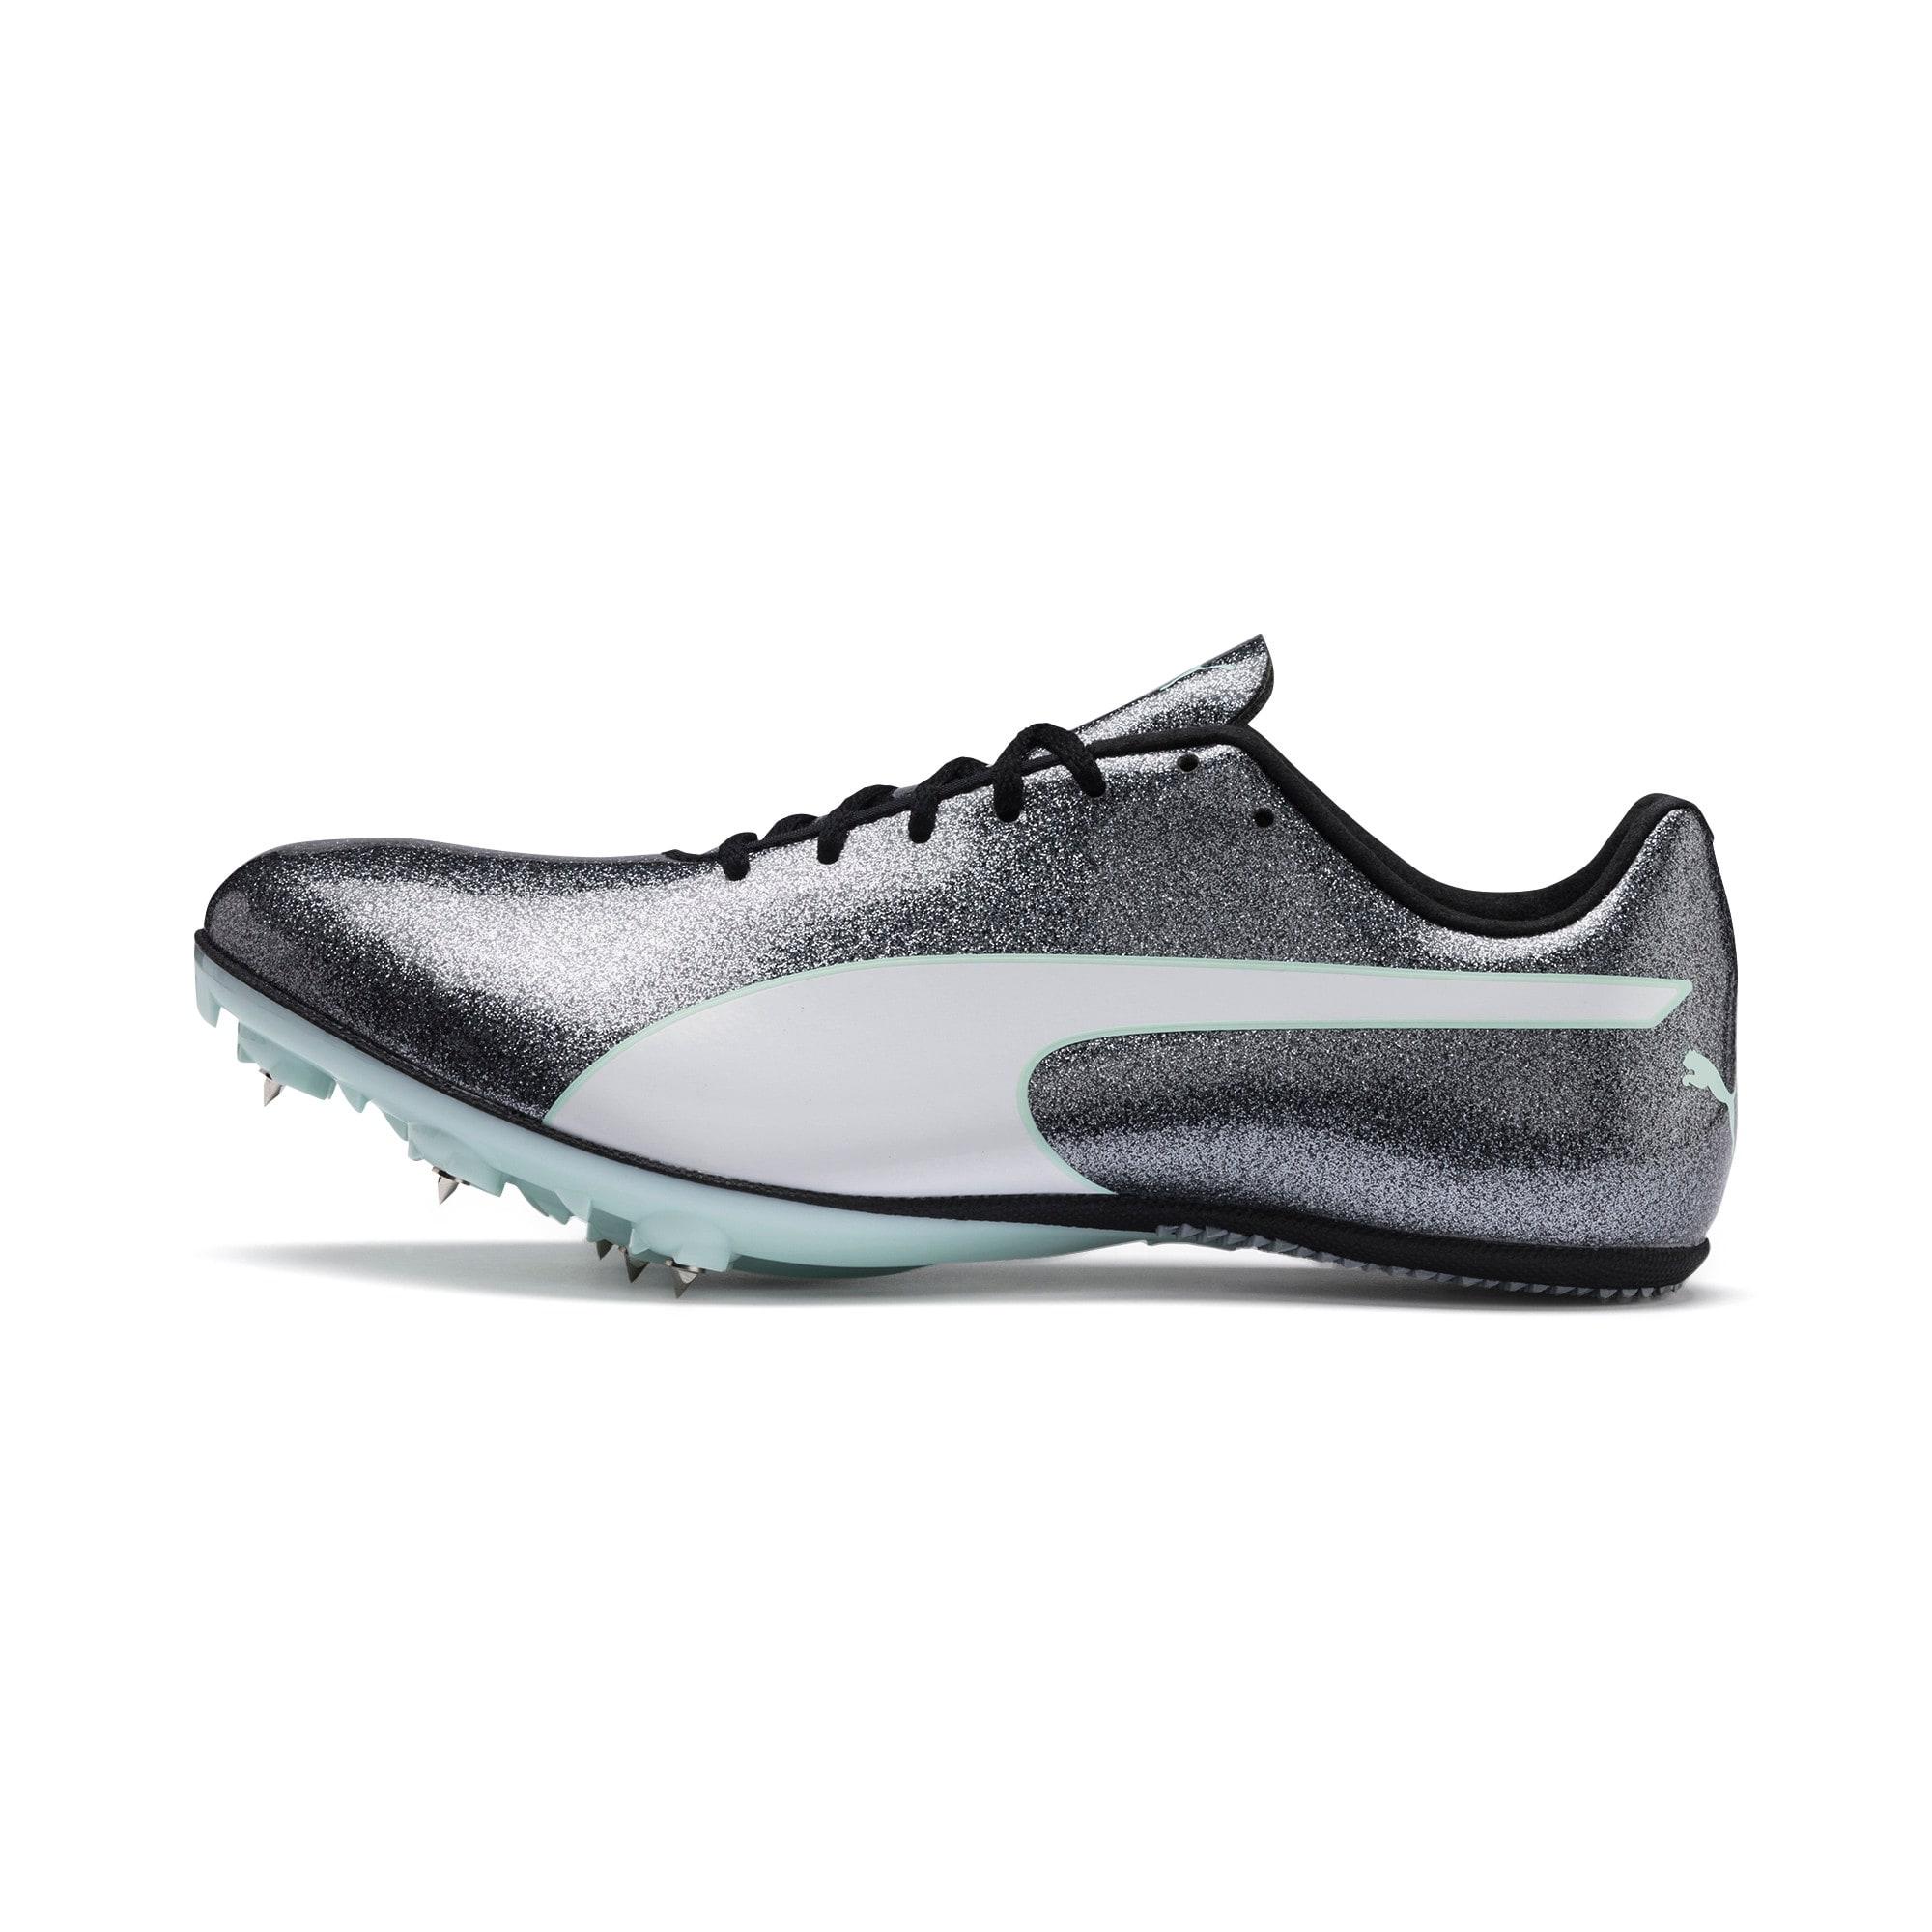 Thumbnail 1 of evoSPEED Sprint 9 hardloopschoenen voor dames, Steel Gray-Fair Aqua-White, medium